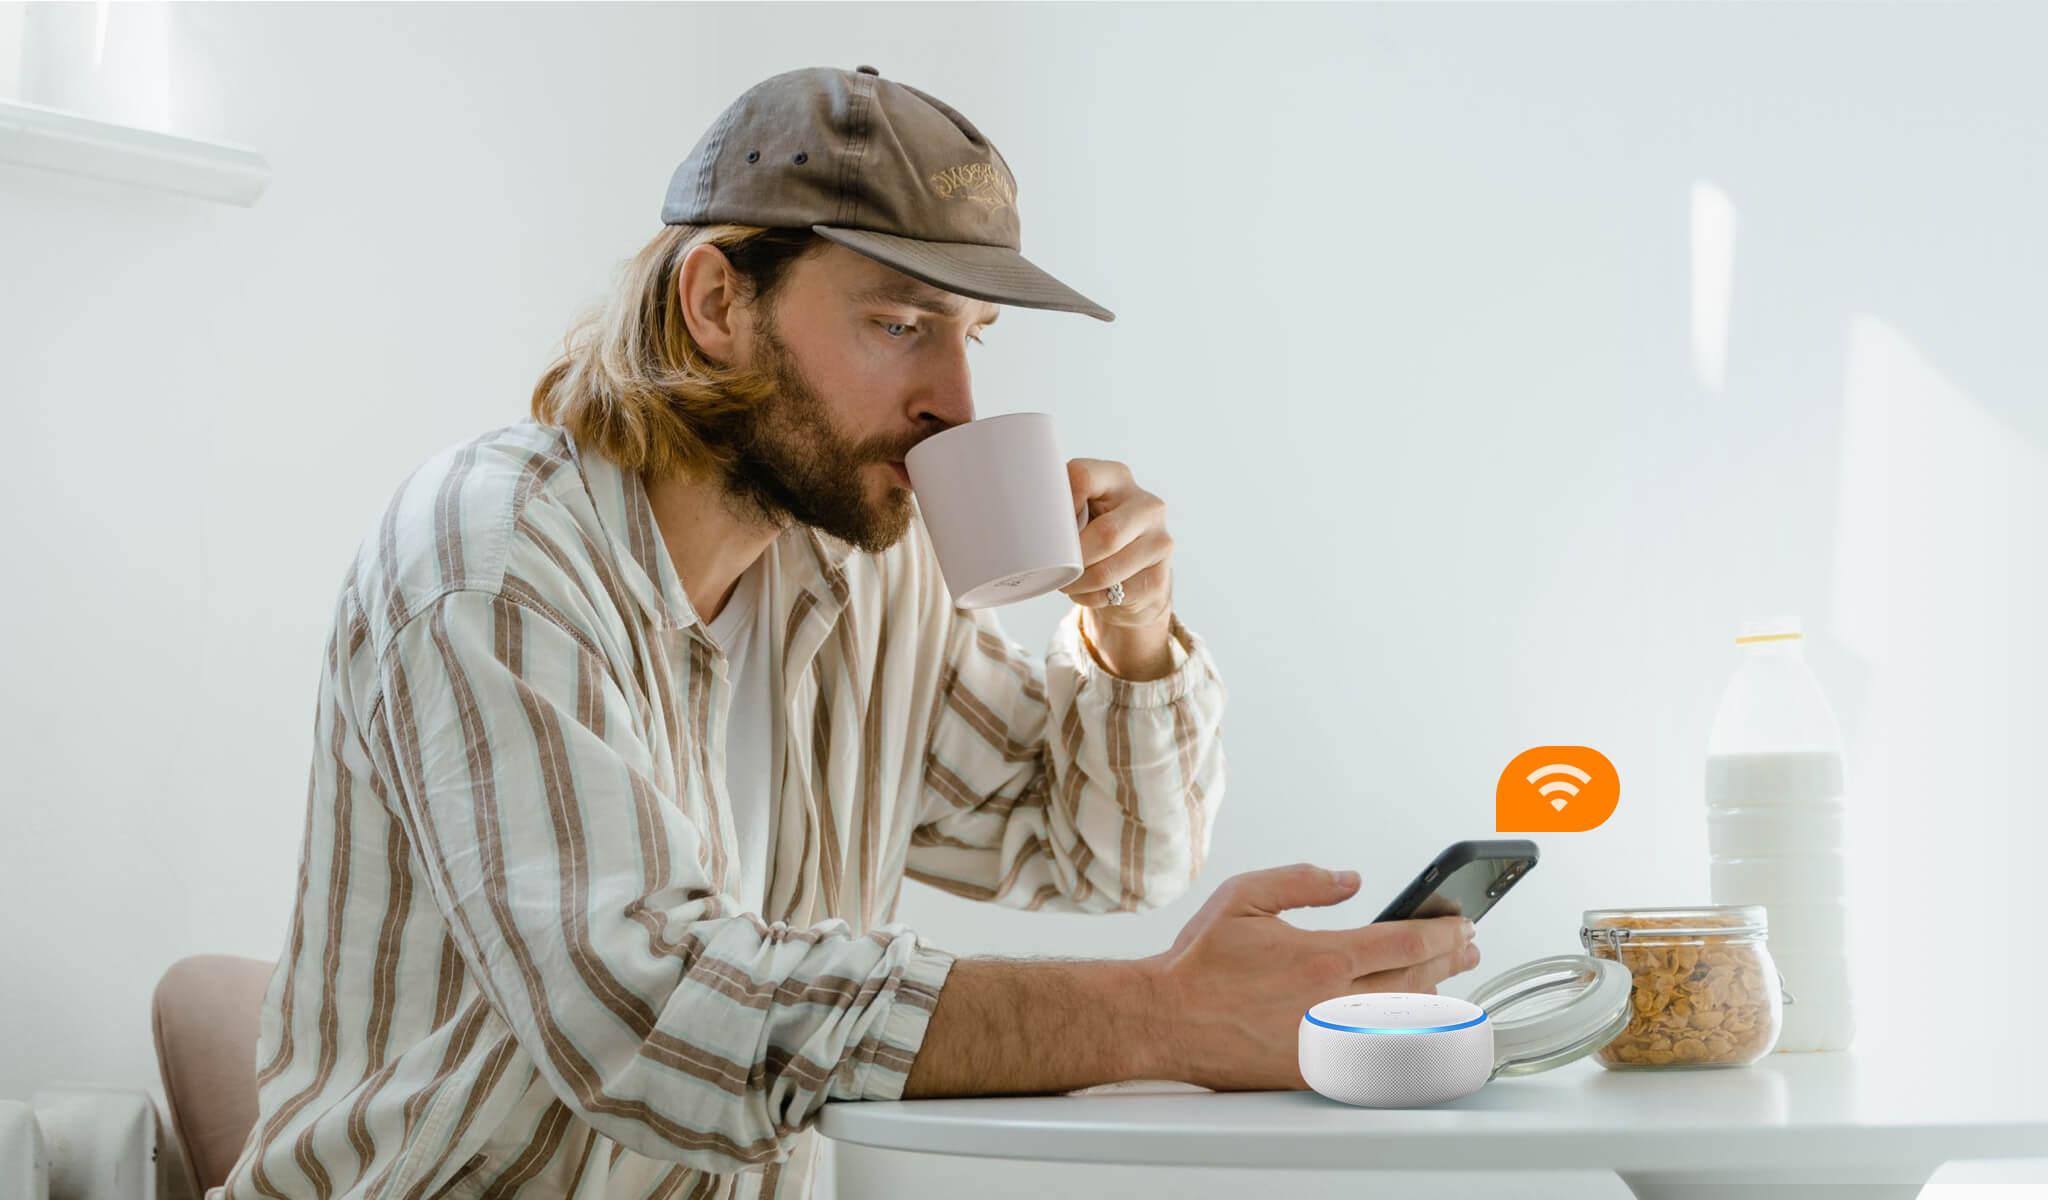 Tuya Wi-Fi Solutions